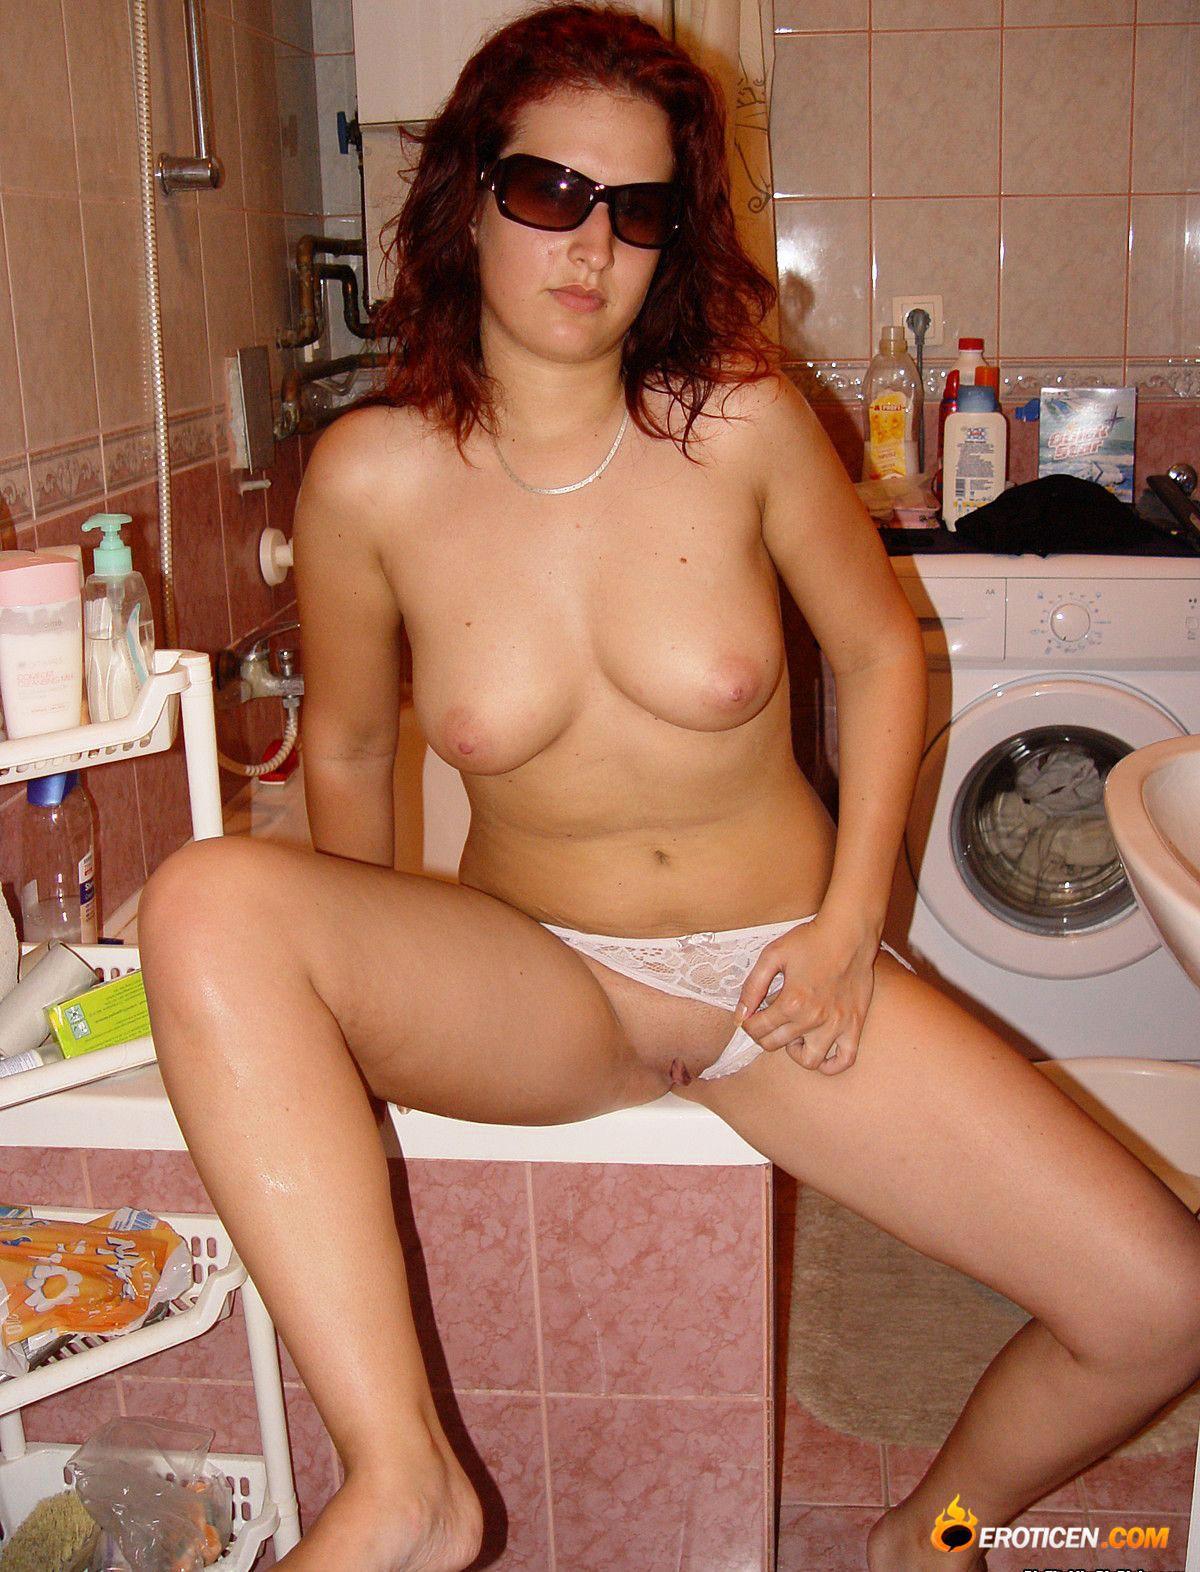 Домашняя эротика с молодой домохозяйкой